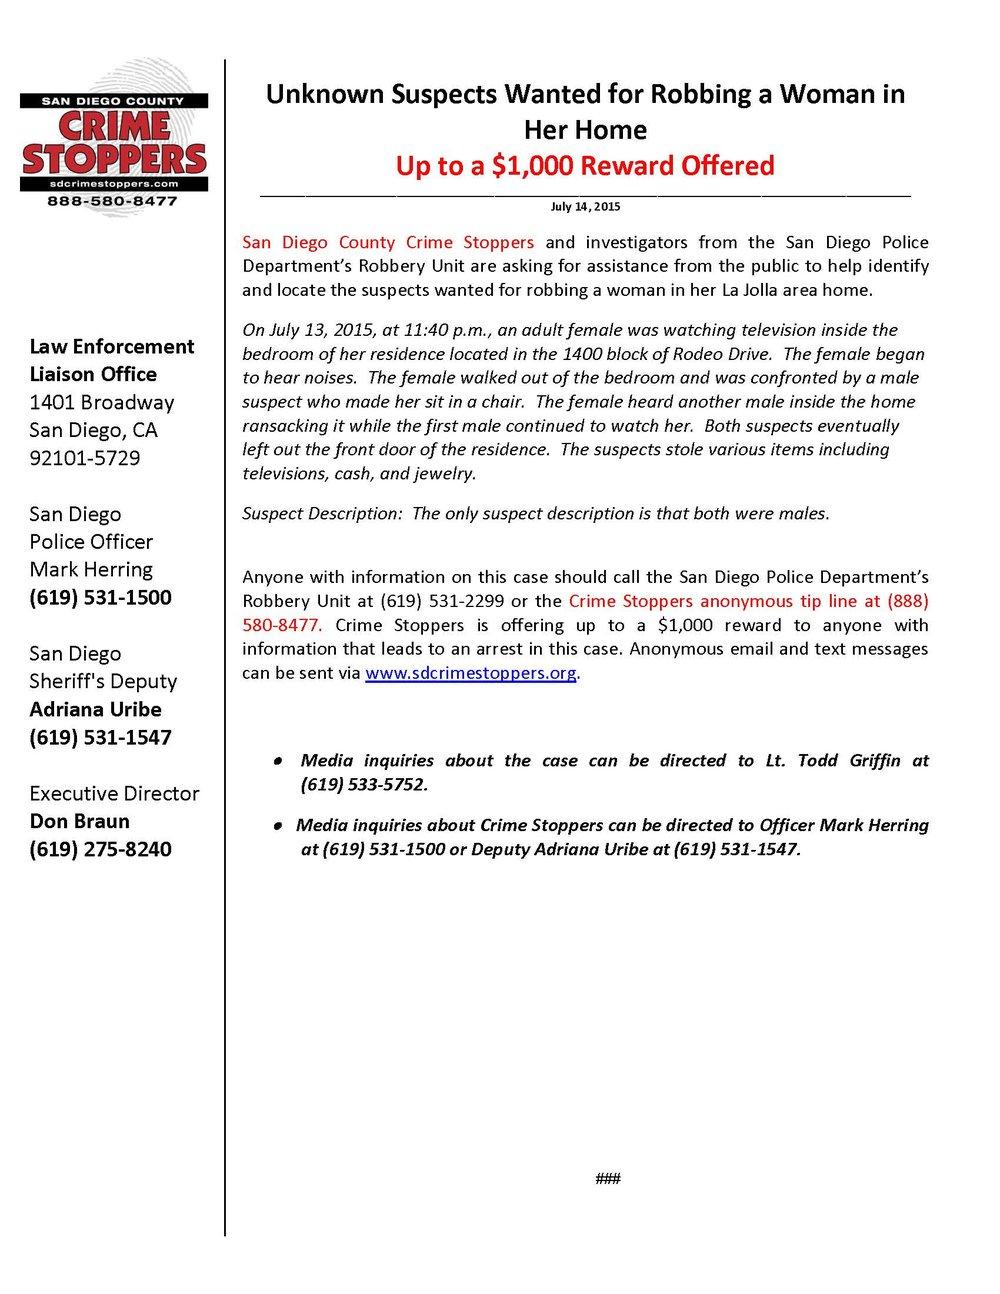 071415 La Jolla Area Residential Robbery